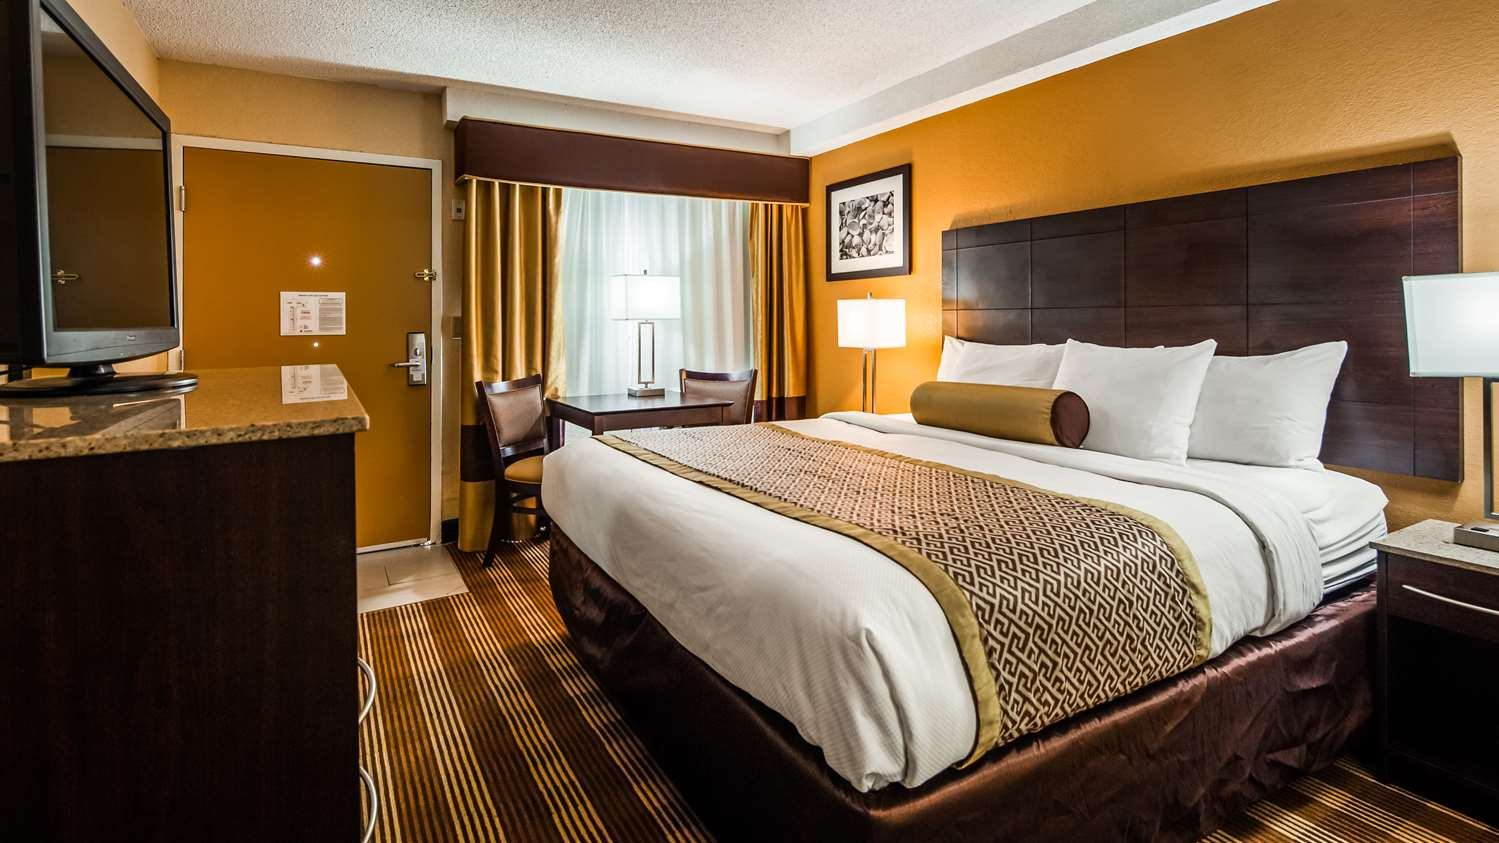 Room - Best Western Cape Cod Hotel Hyannis